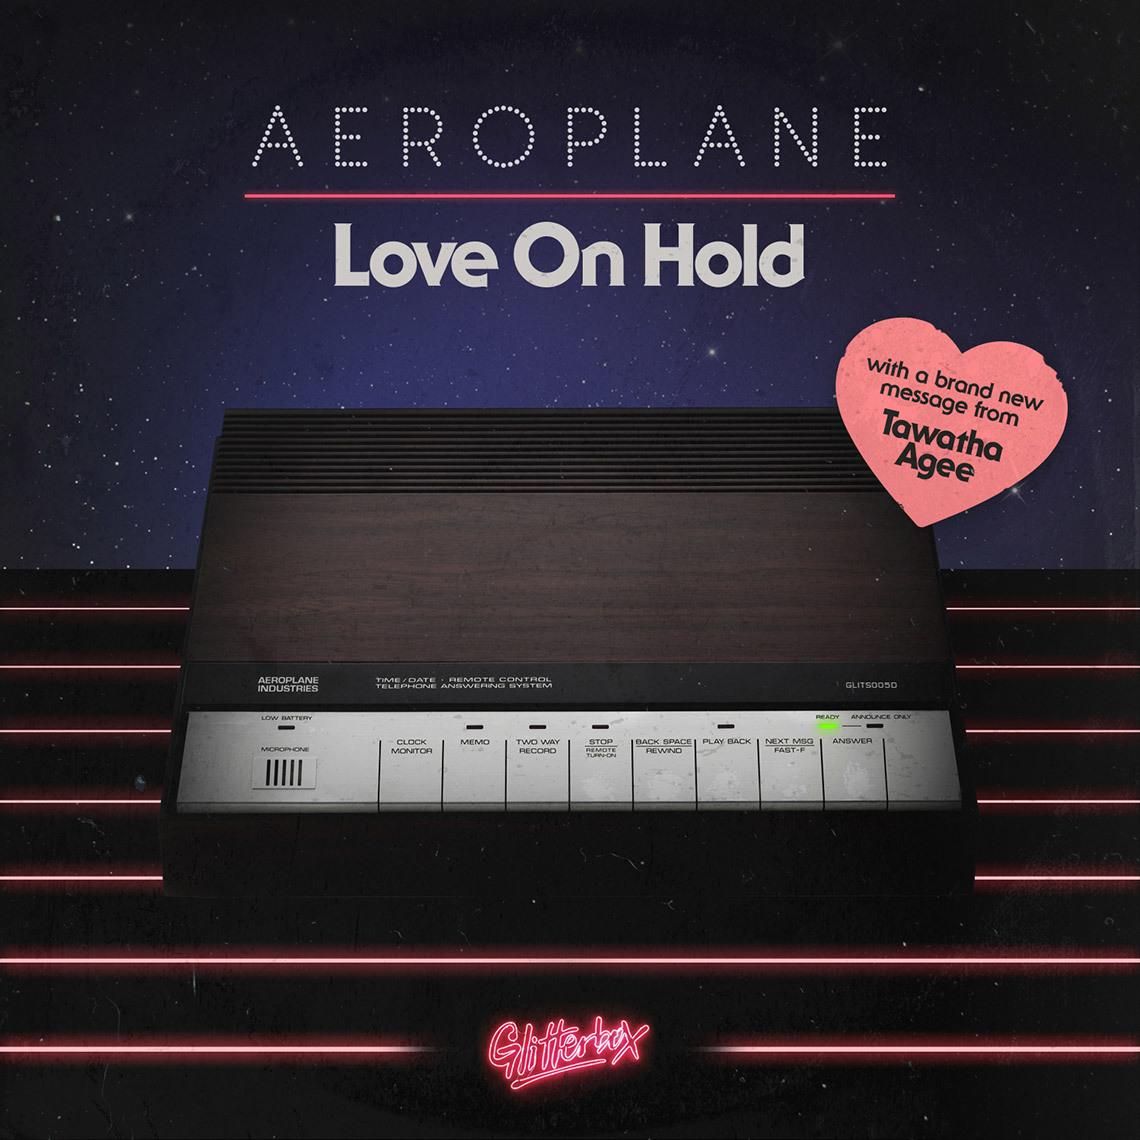 Aeroplane loveonhold